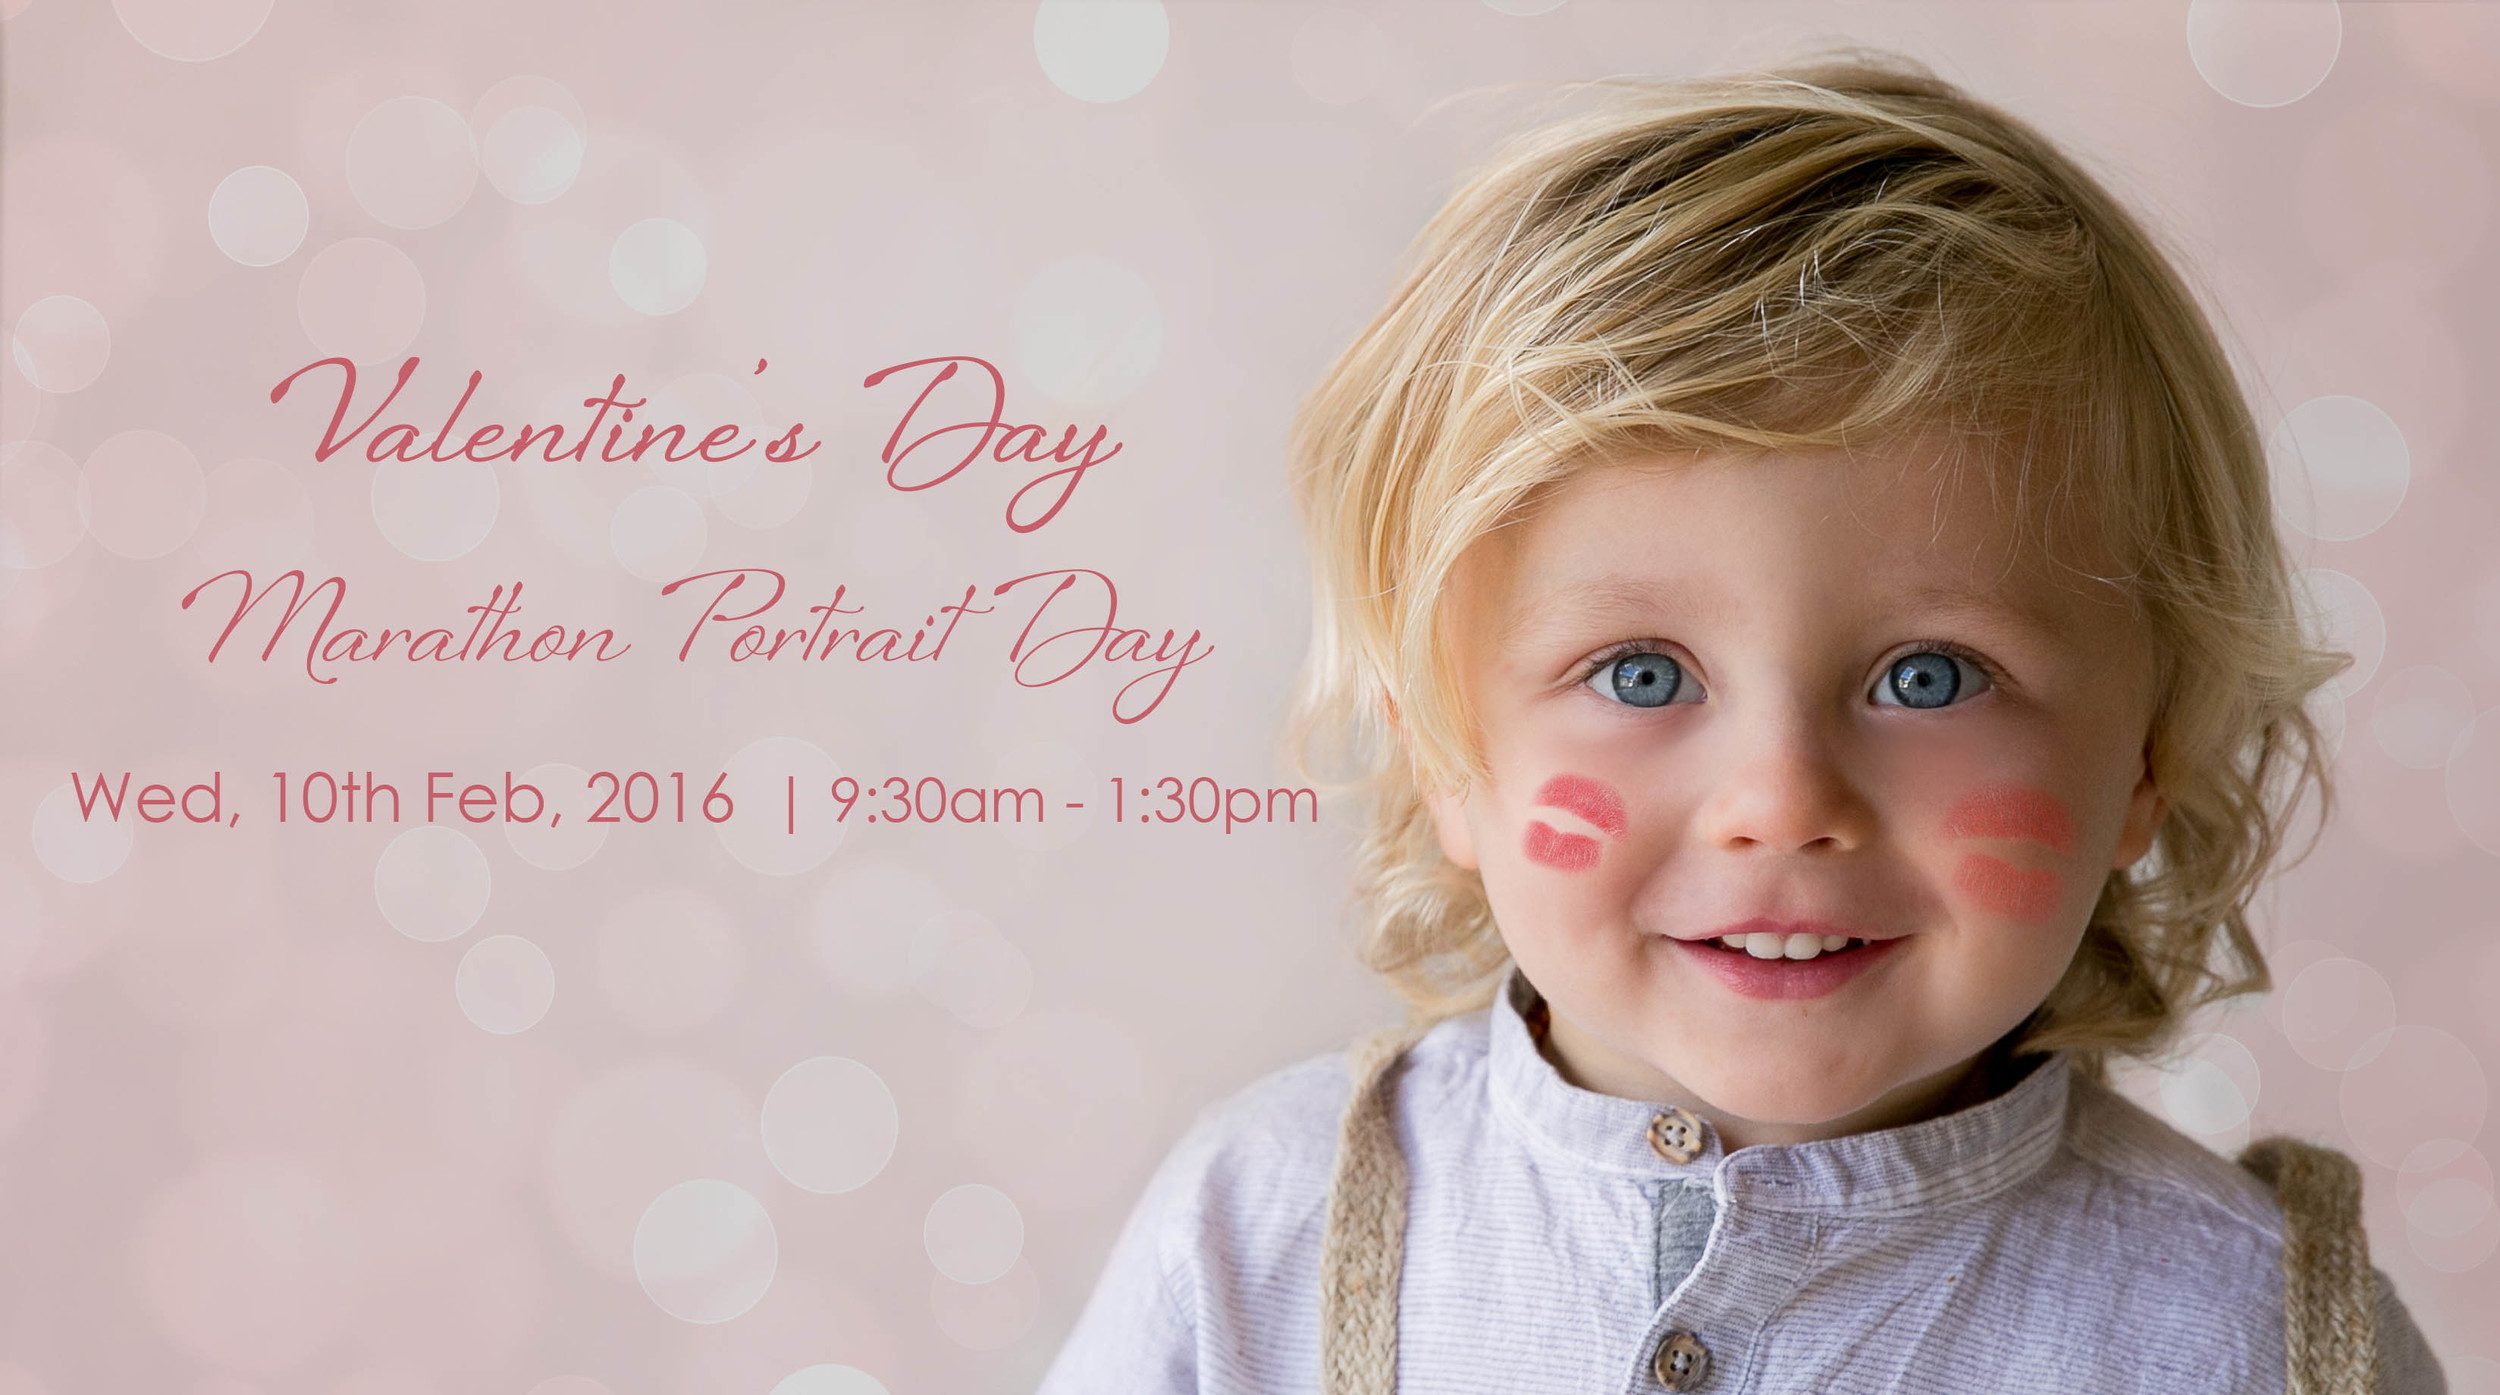 valentine's day photos love photos kisses hearts